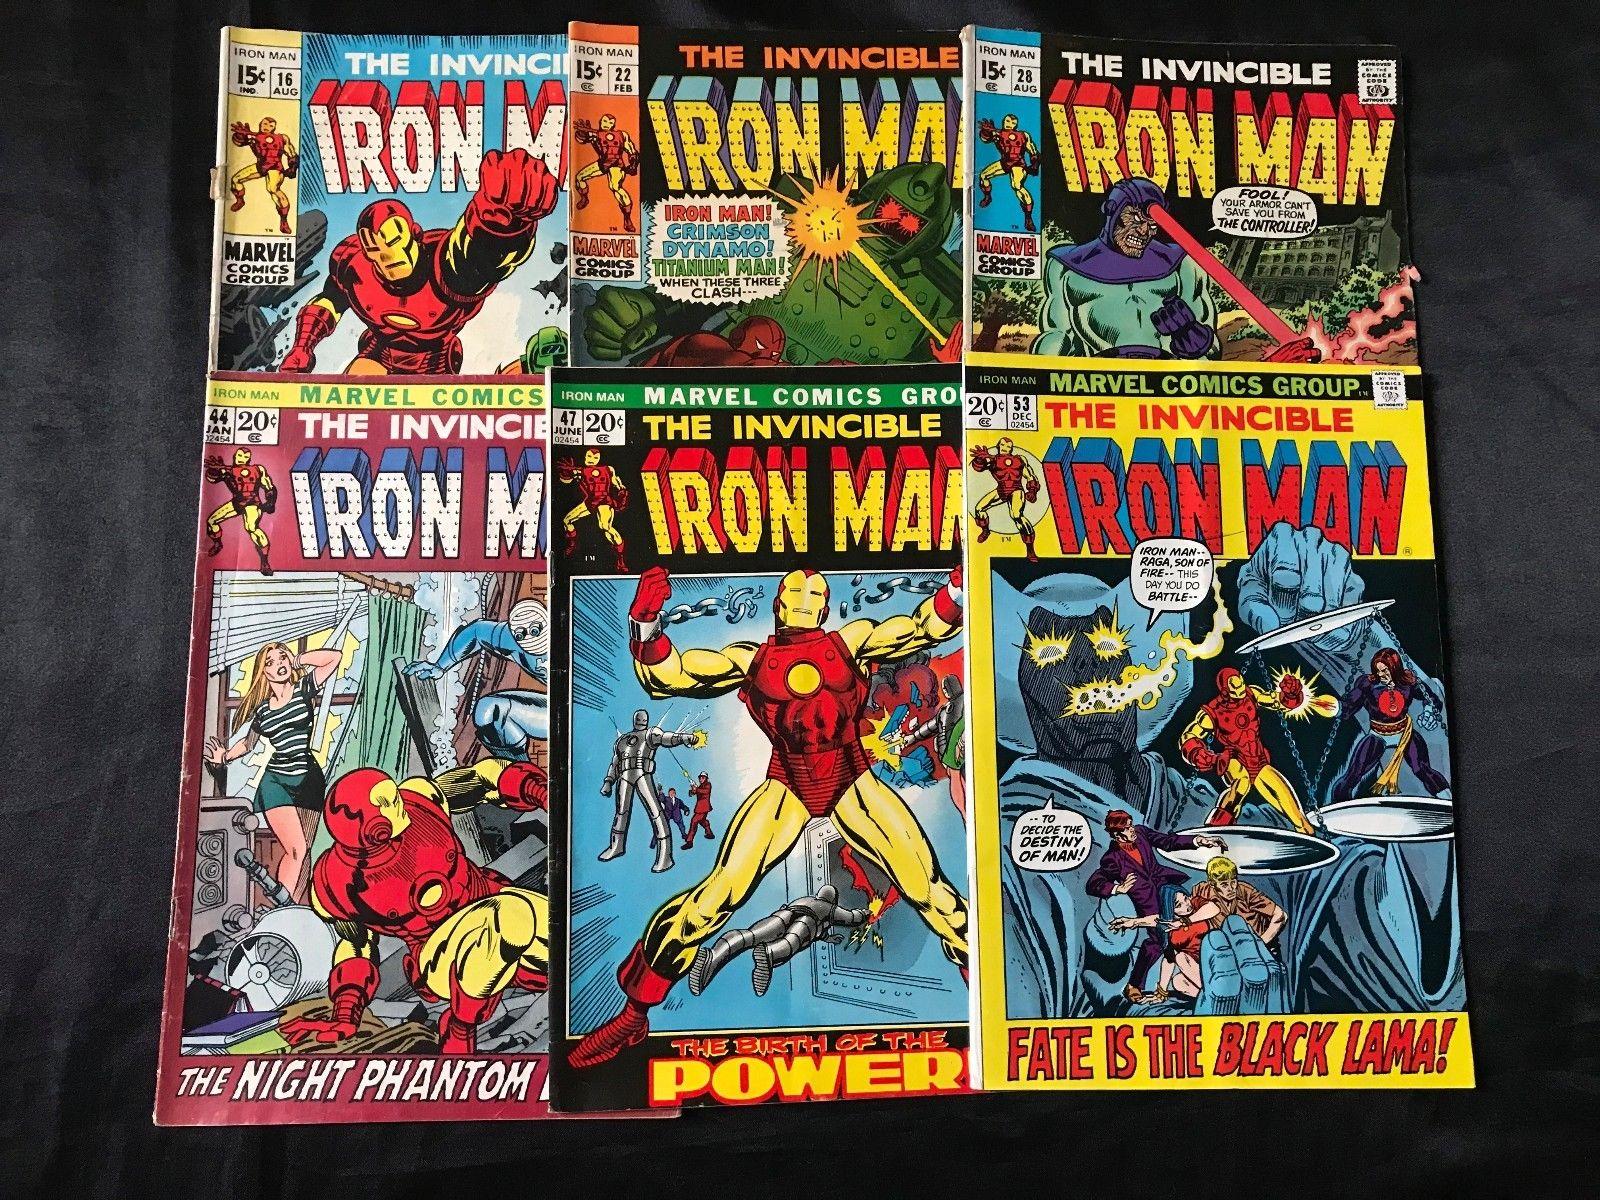 LOT OF 6 THE INVINCIBLE IRON MAN COMIC BOOKS #16 #22 #28 #44 #47 #53